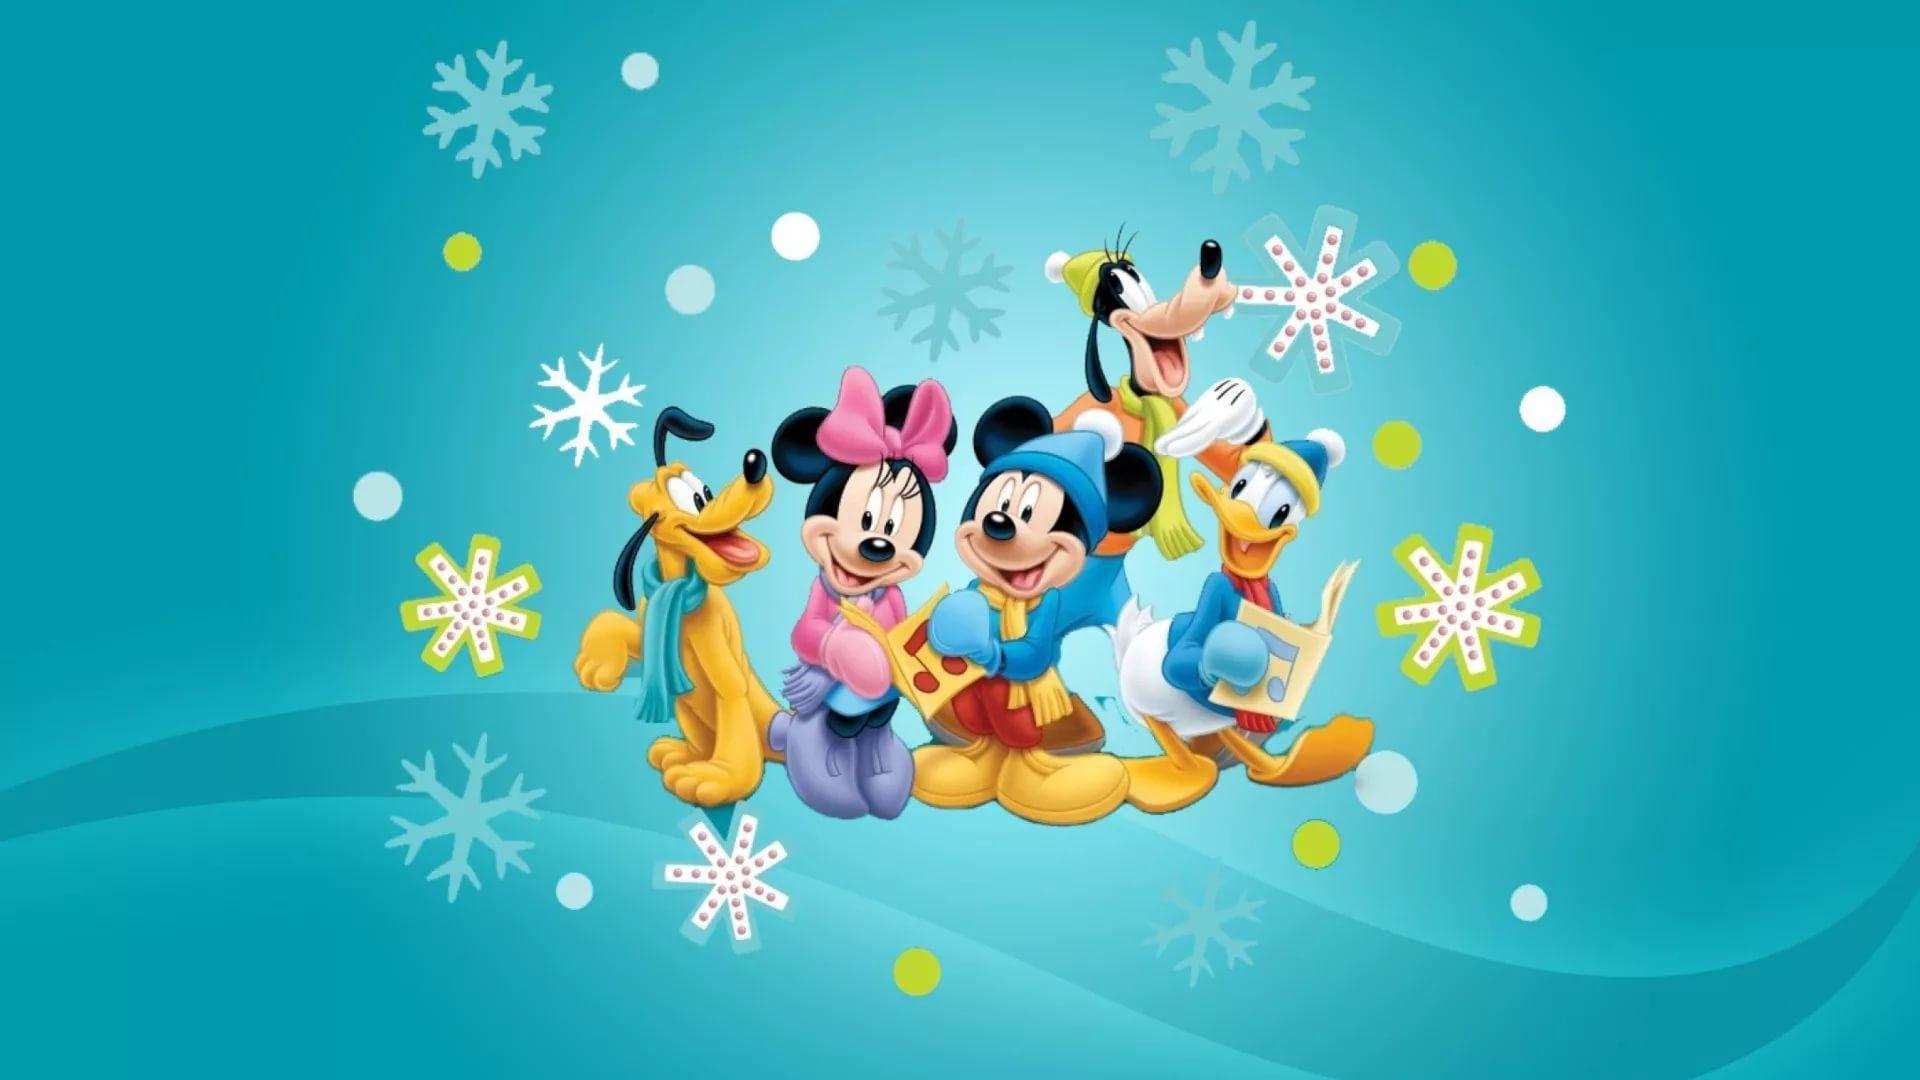 Disney Christmas Wallpaper Theme